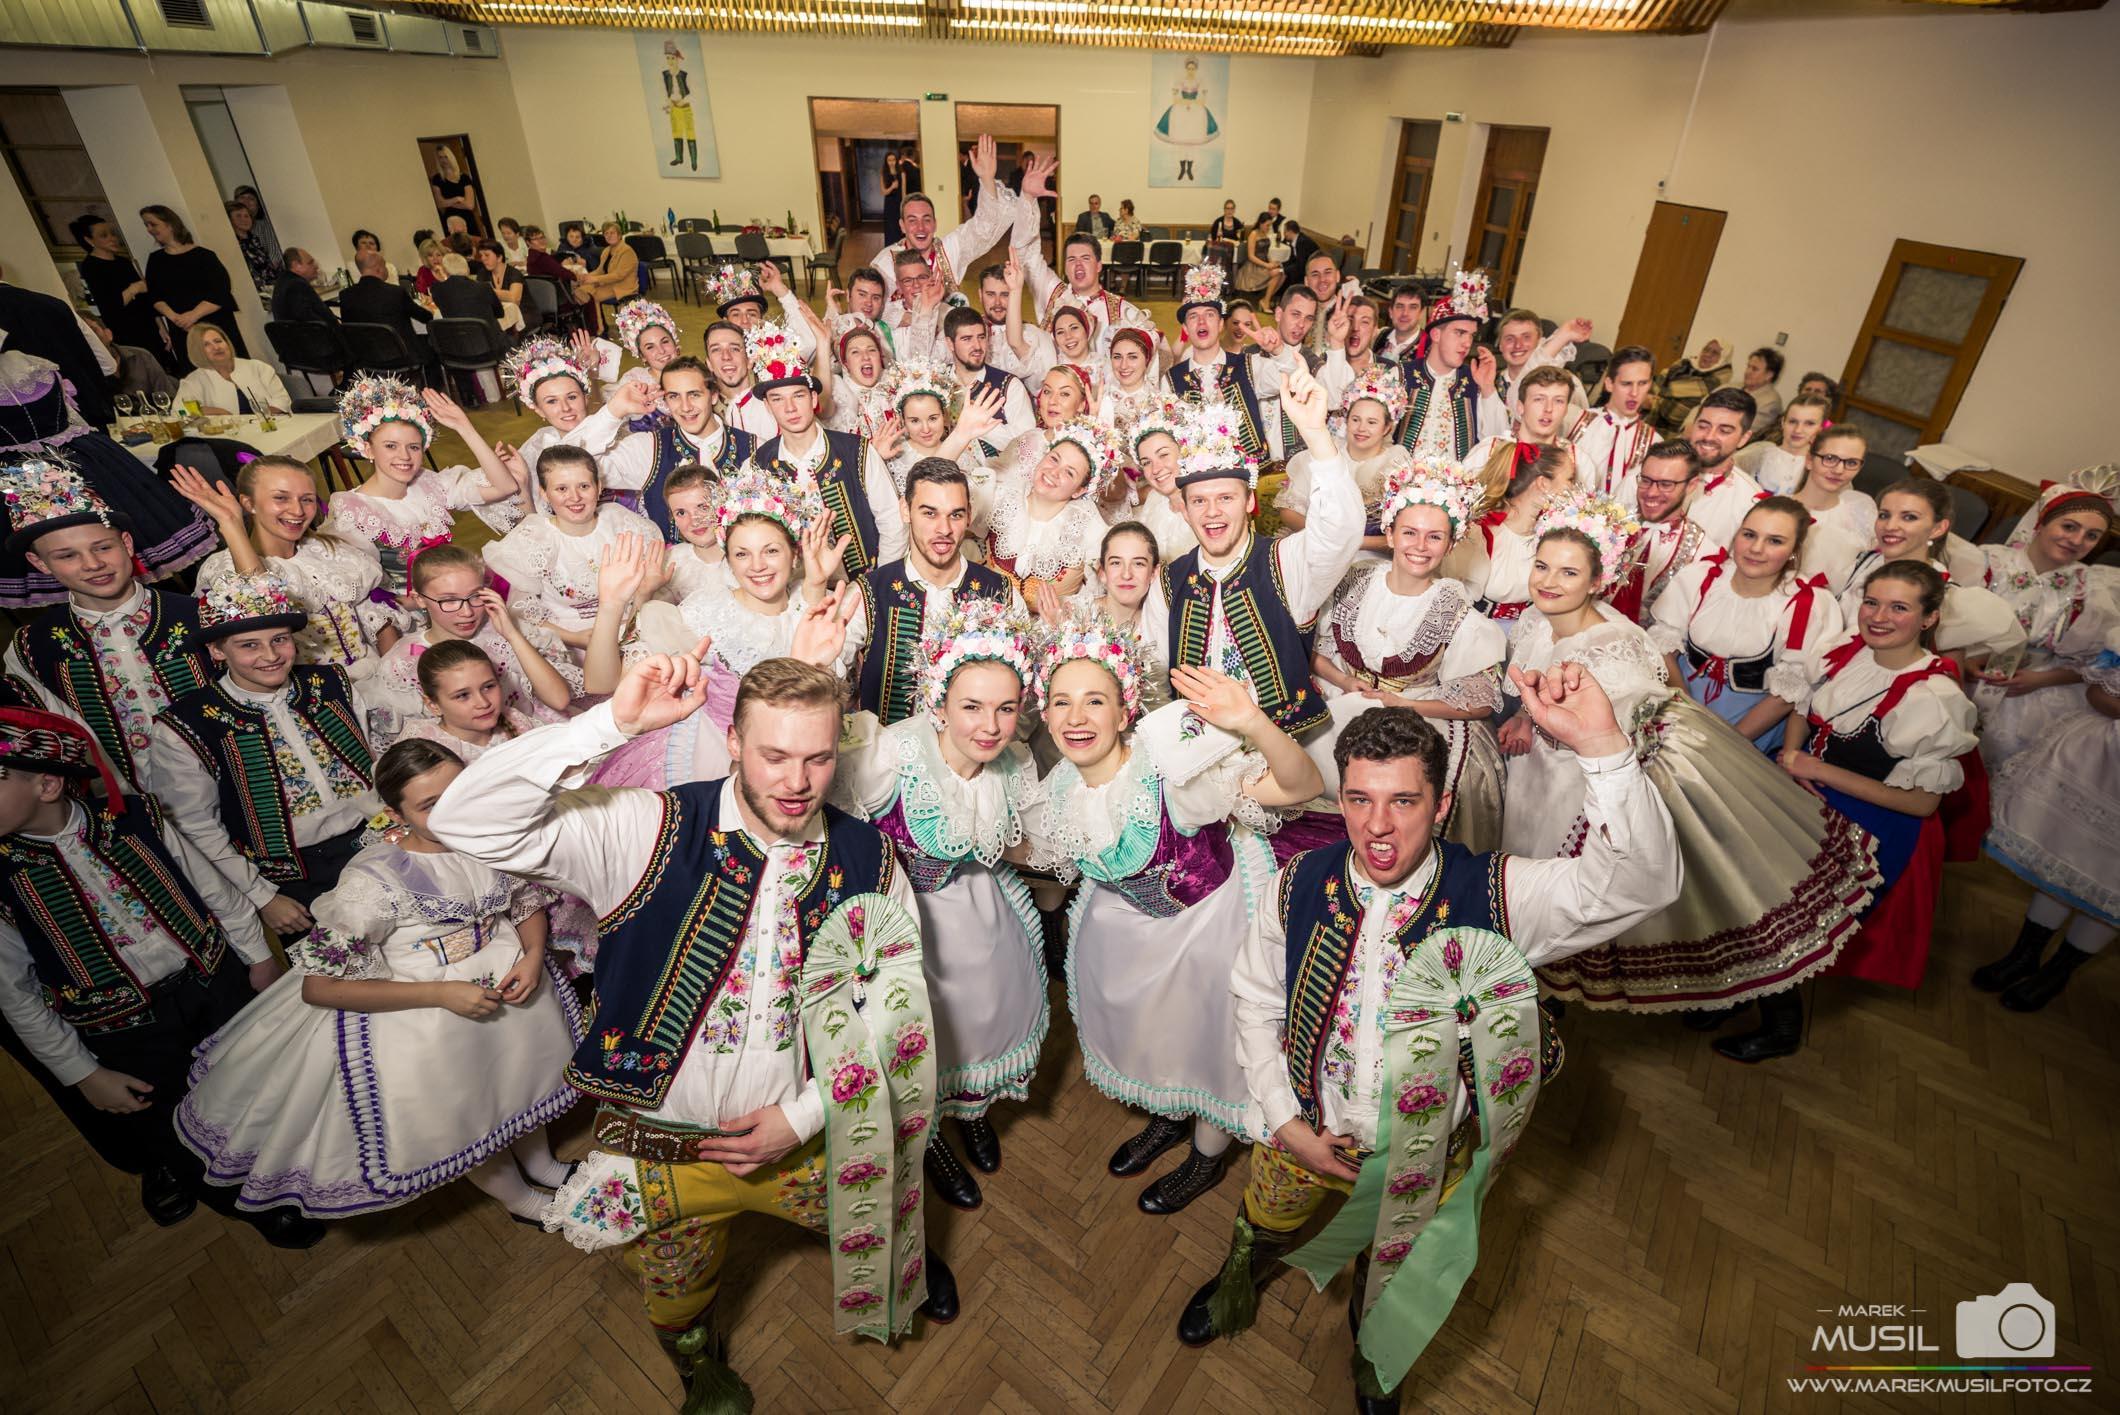 Nejlepší fotografie z plesu za rok 2018.